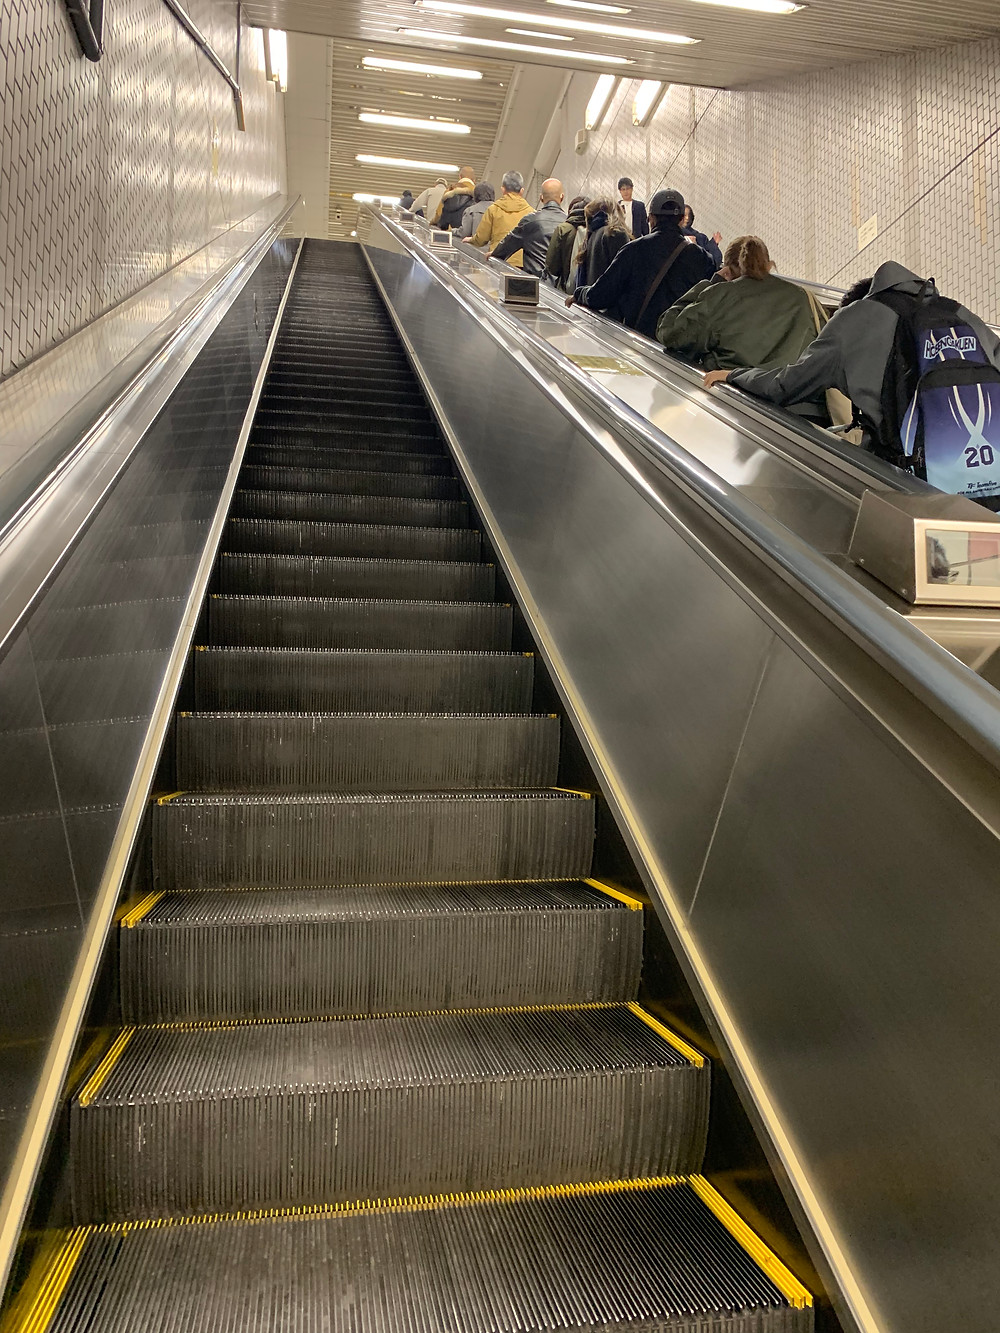 Escalator in Tokyo